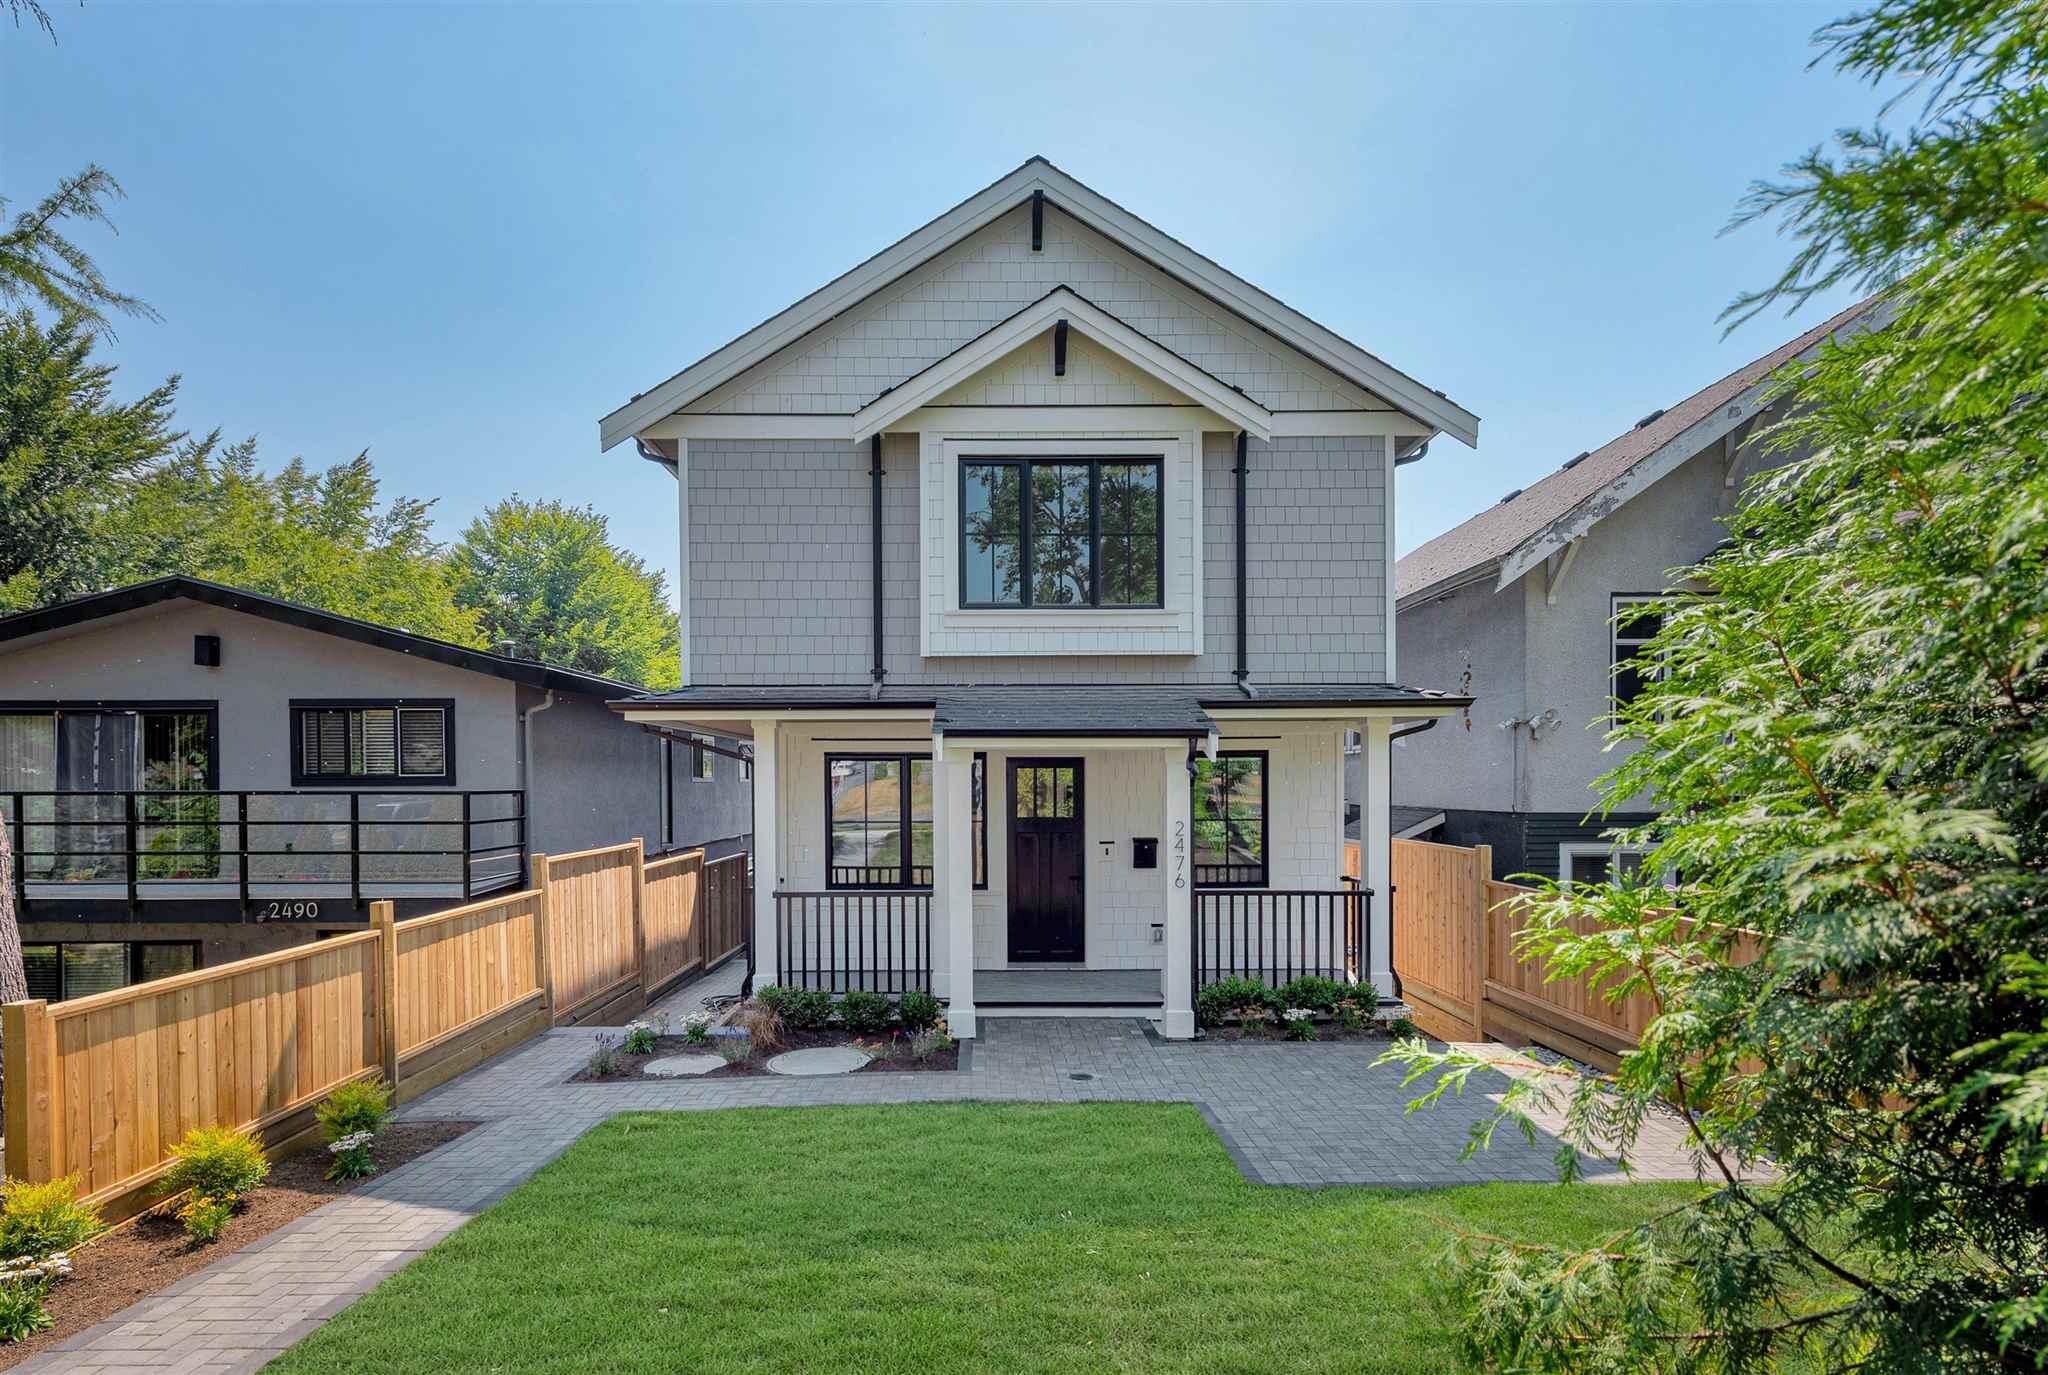 2476 E PENDER STREET - Renfrew VE 1/2 Duplex for sale, 3 Bedrooms (R2607046) - #1